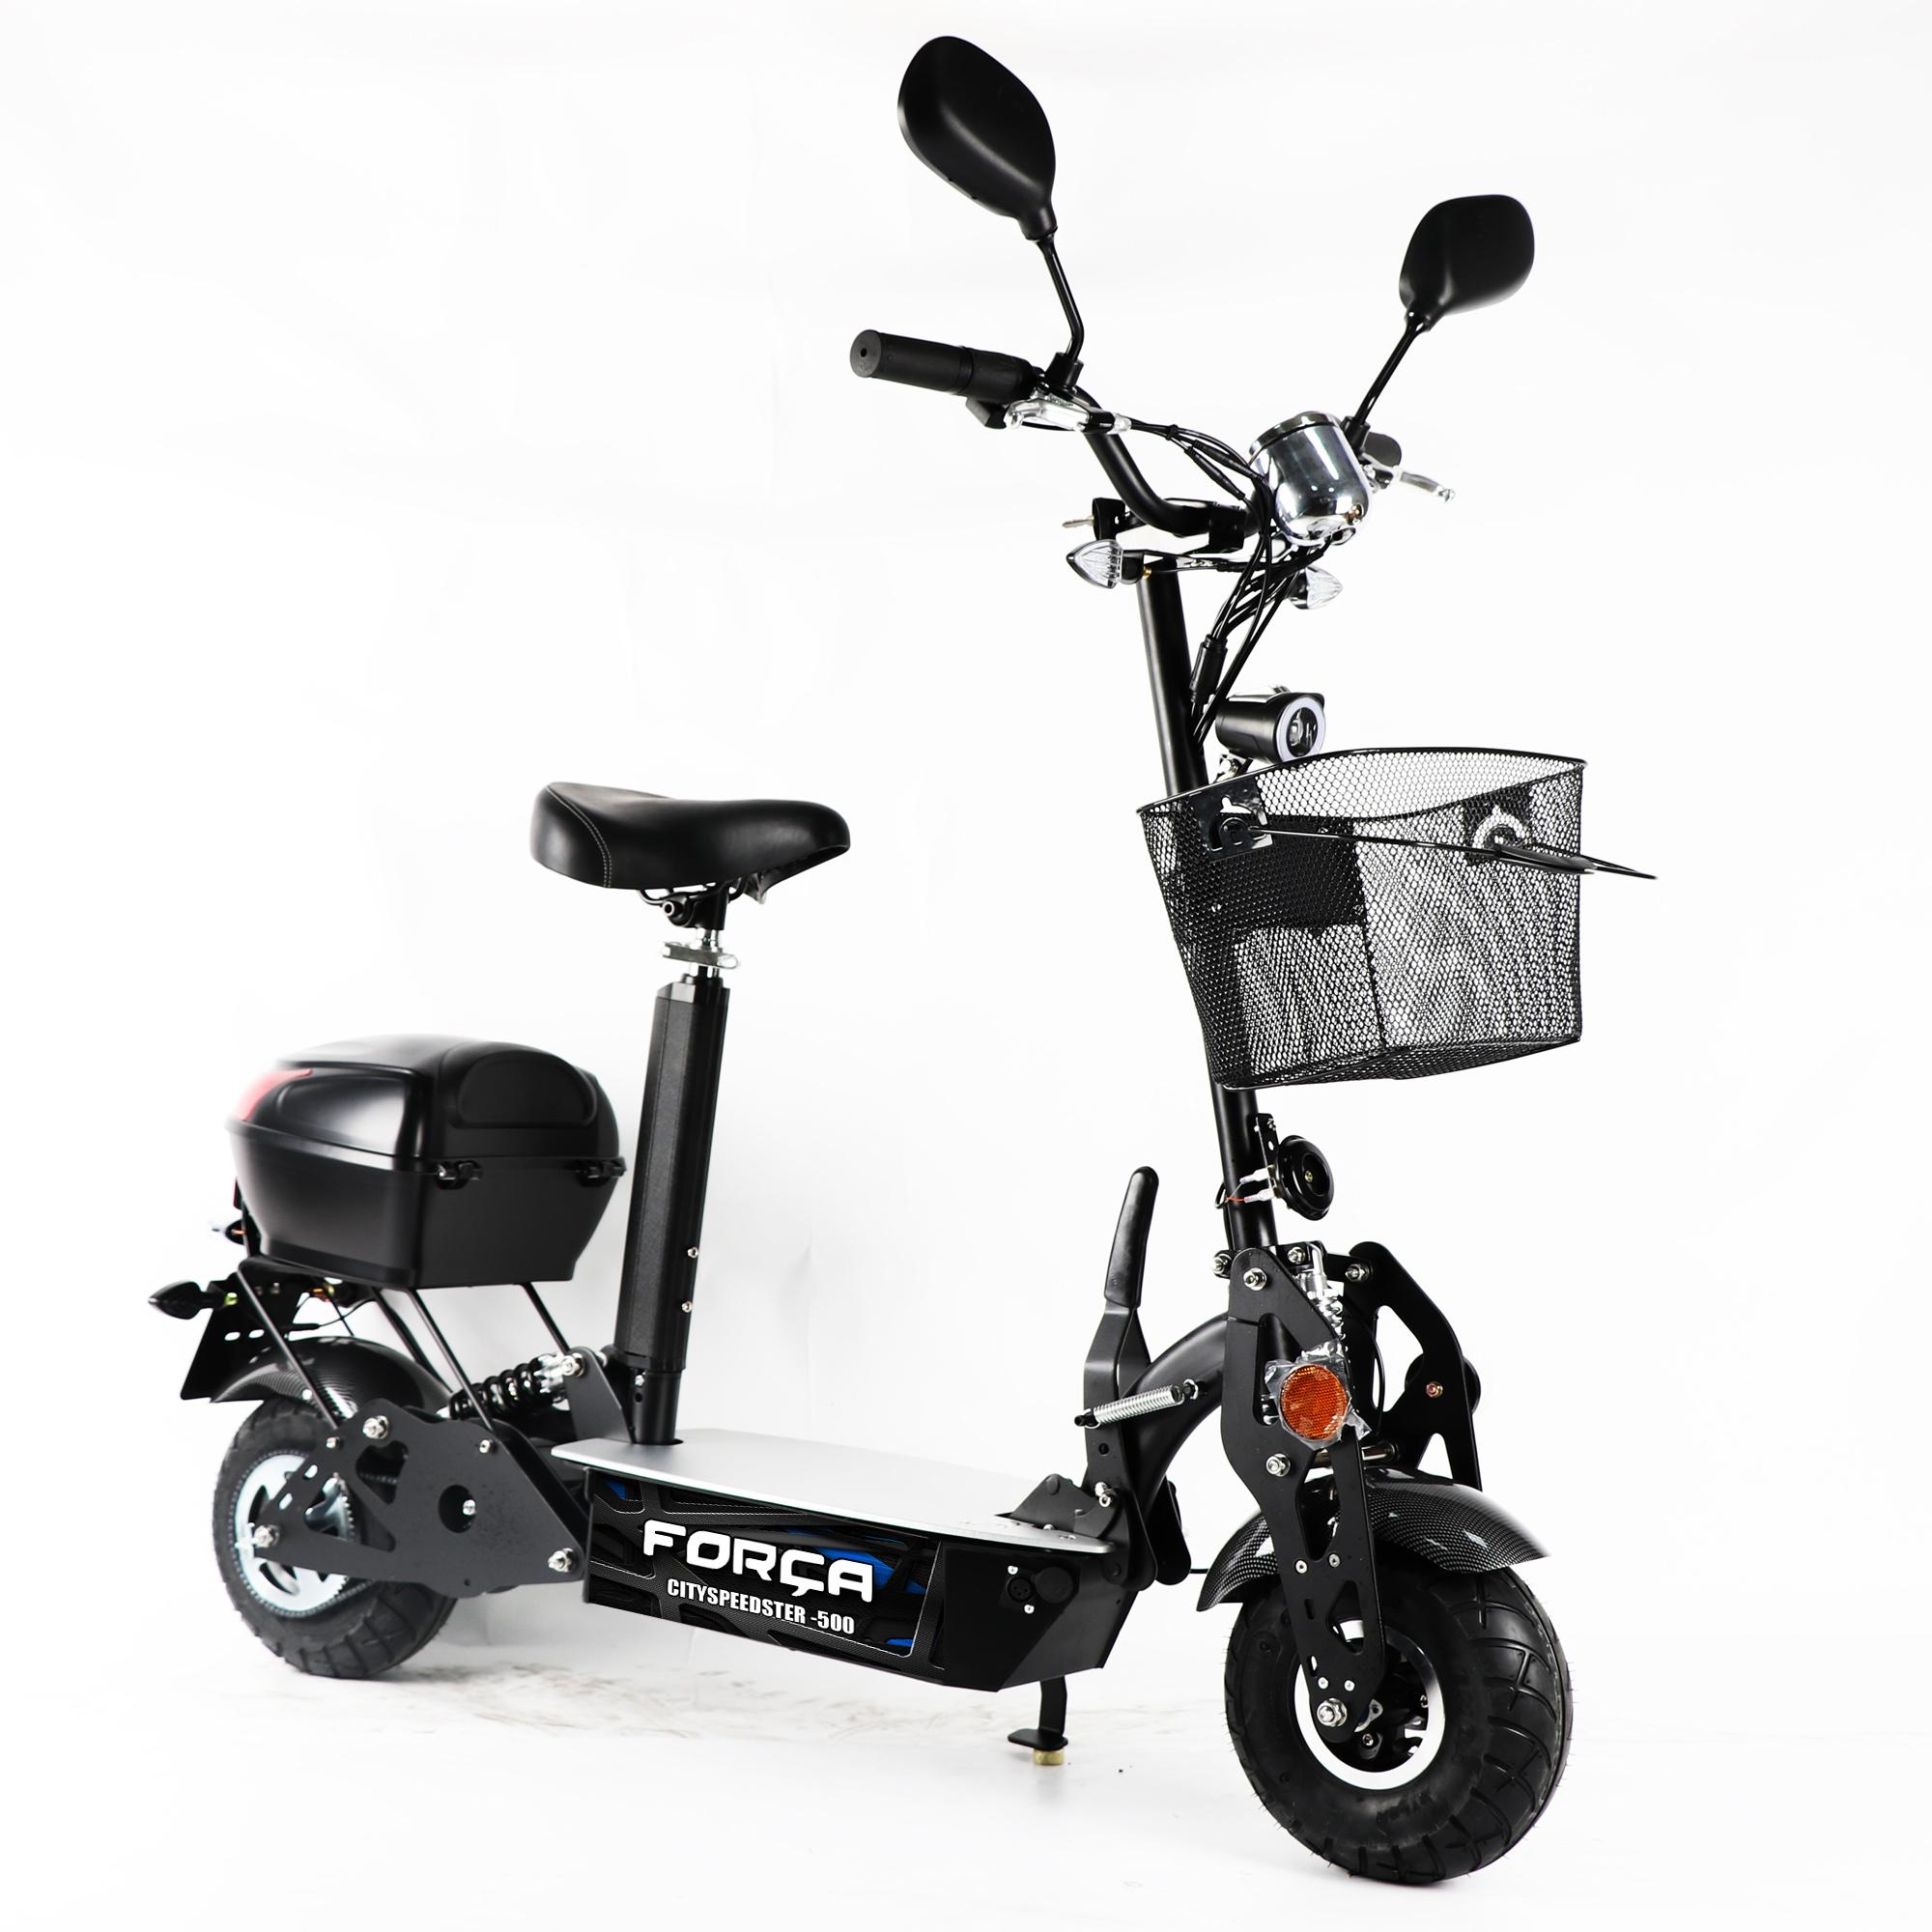 Forca EScooter ElektroRoller CitySpeedster 500 P5 - CitySpeedster-500